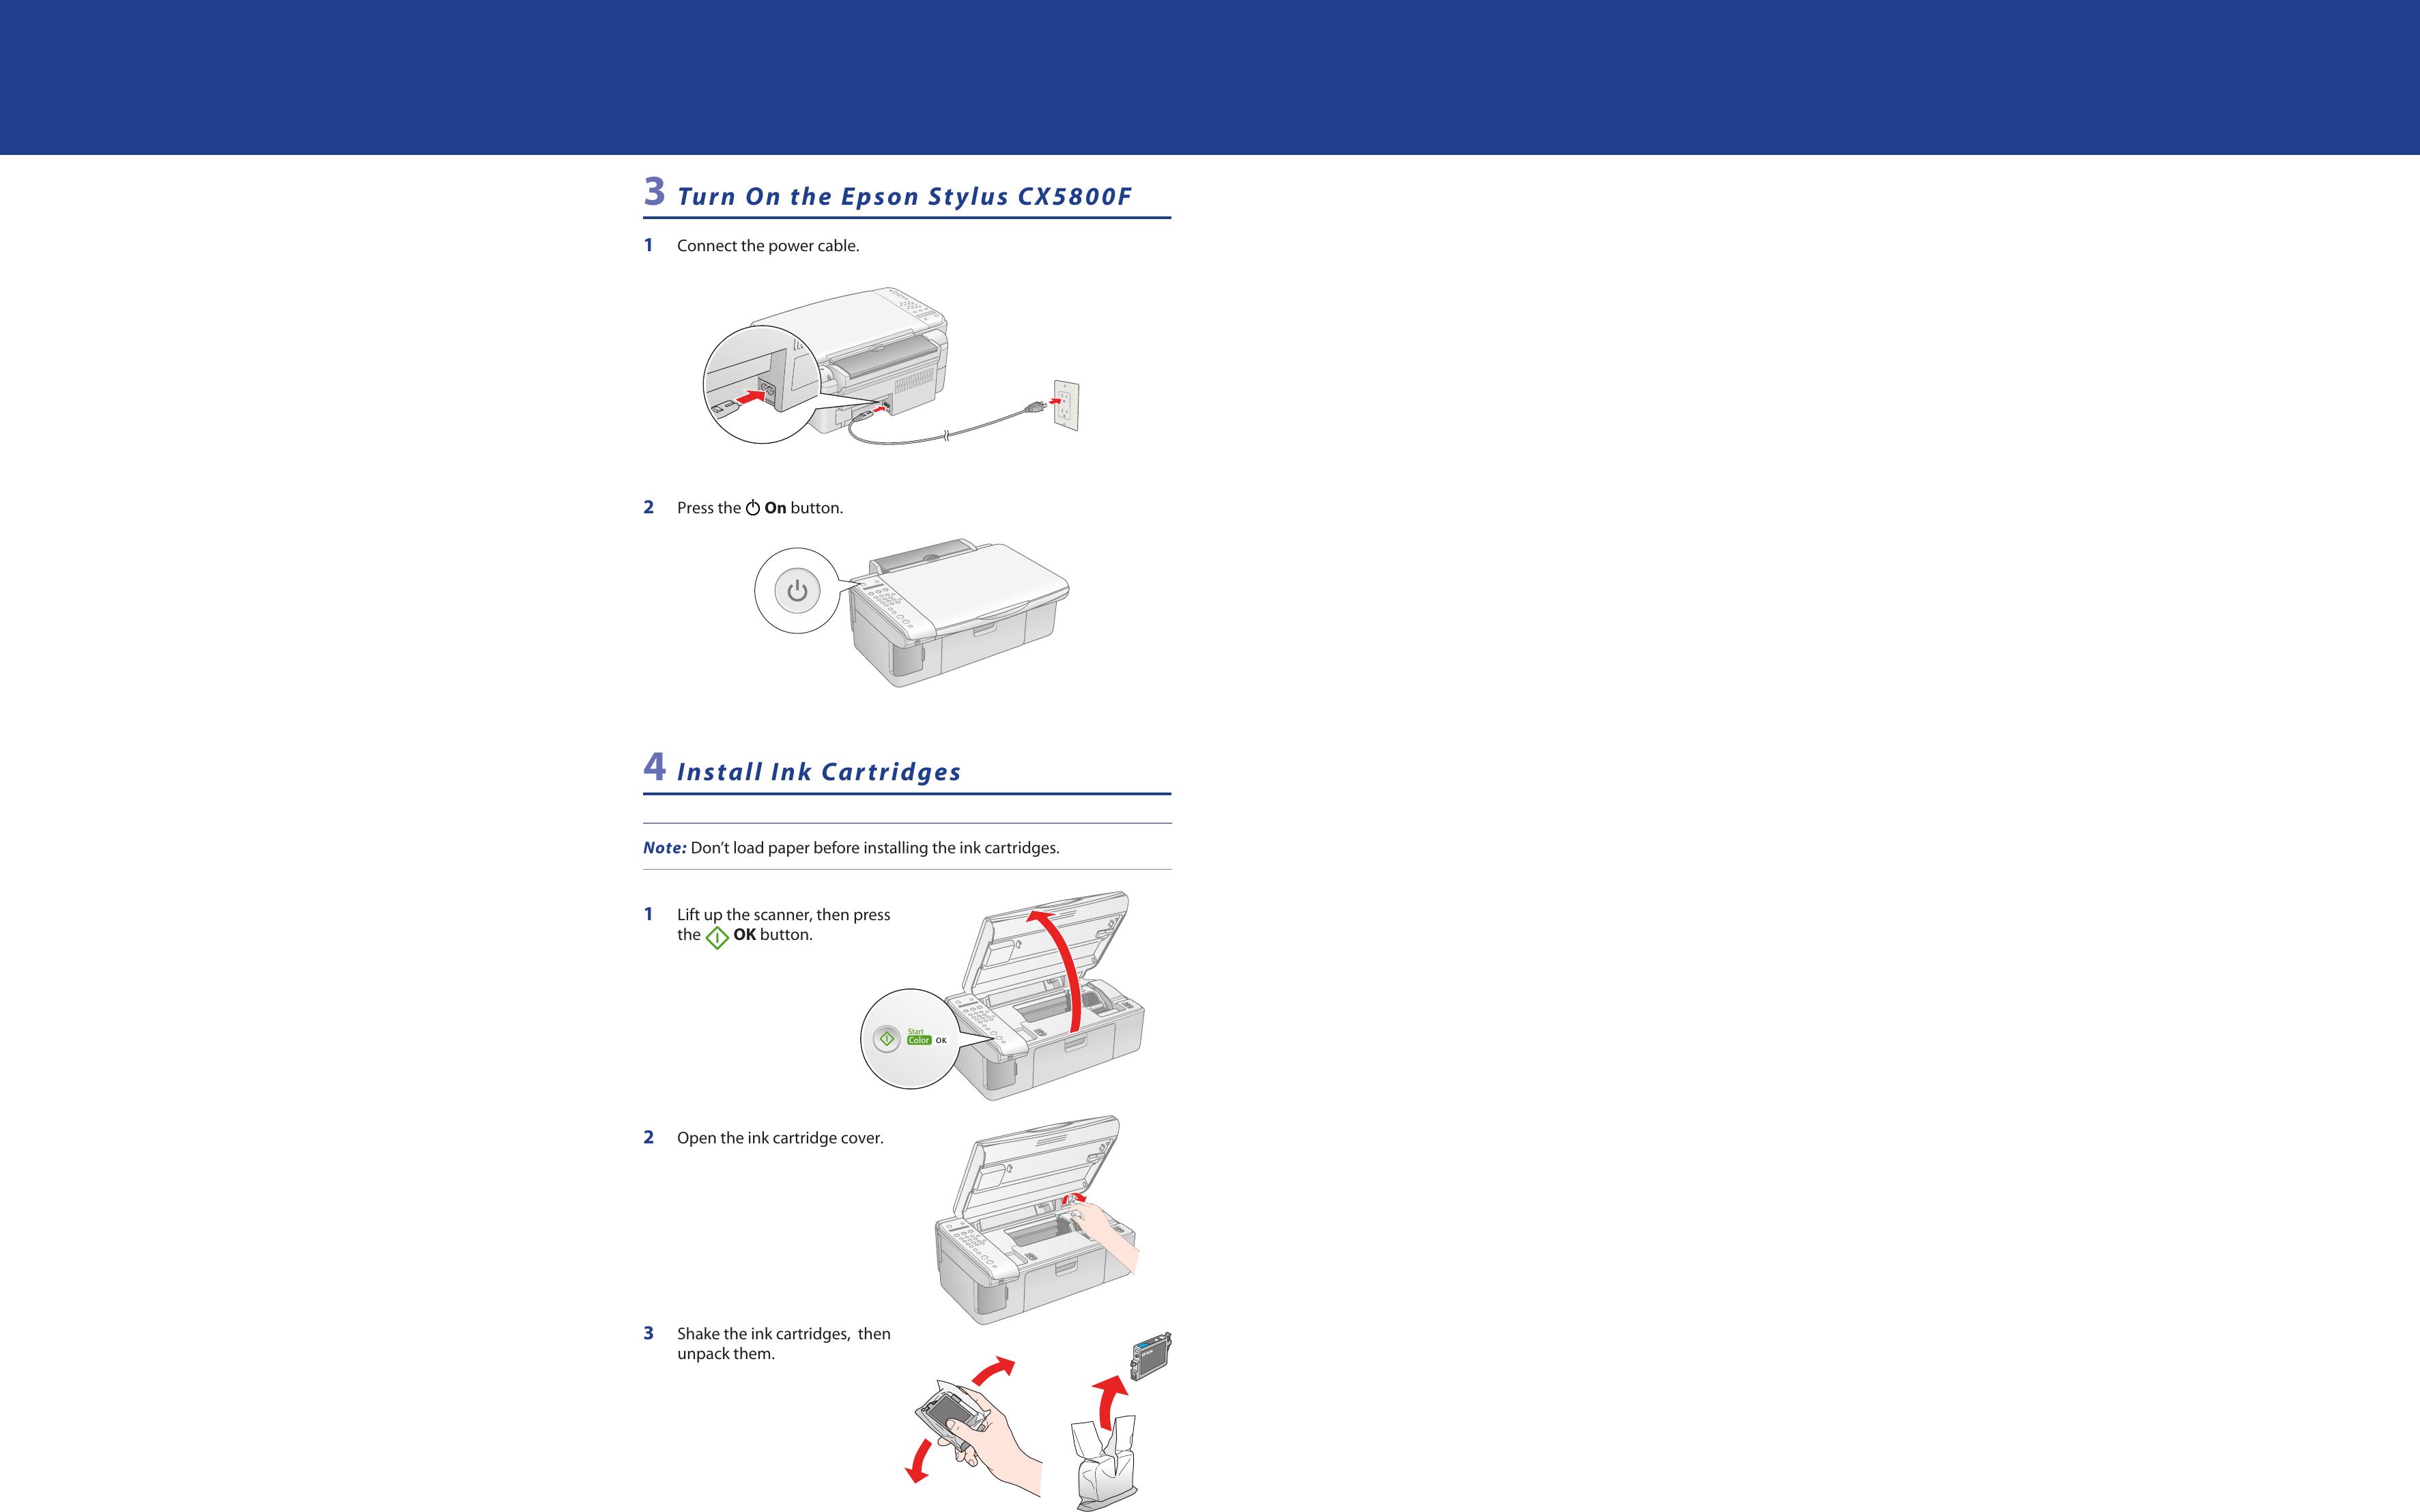 EPSON STYLUS CX5800F ALL-IN-ONE PRINTER WINDOWS 8.1 DRIVER DOWNLOAD